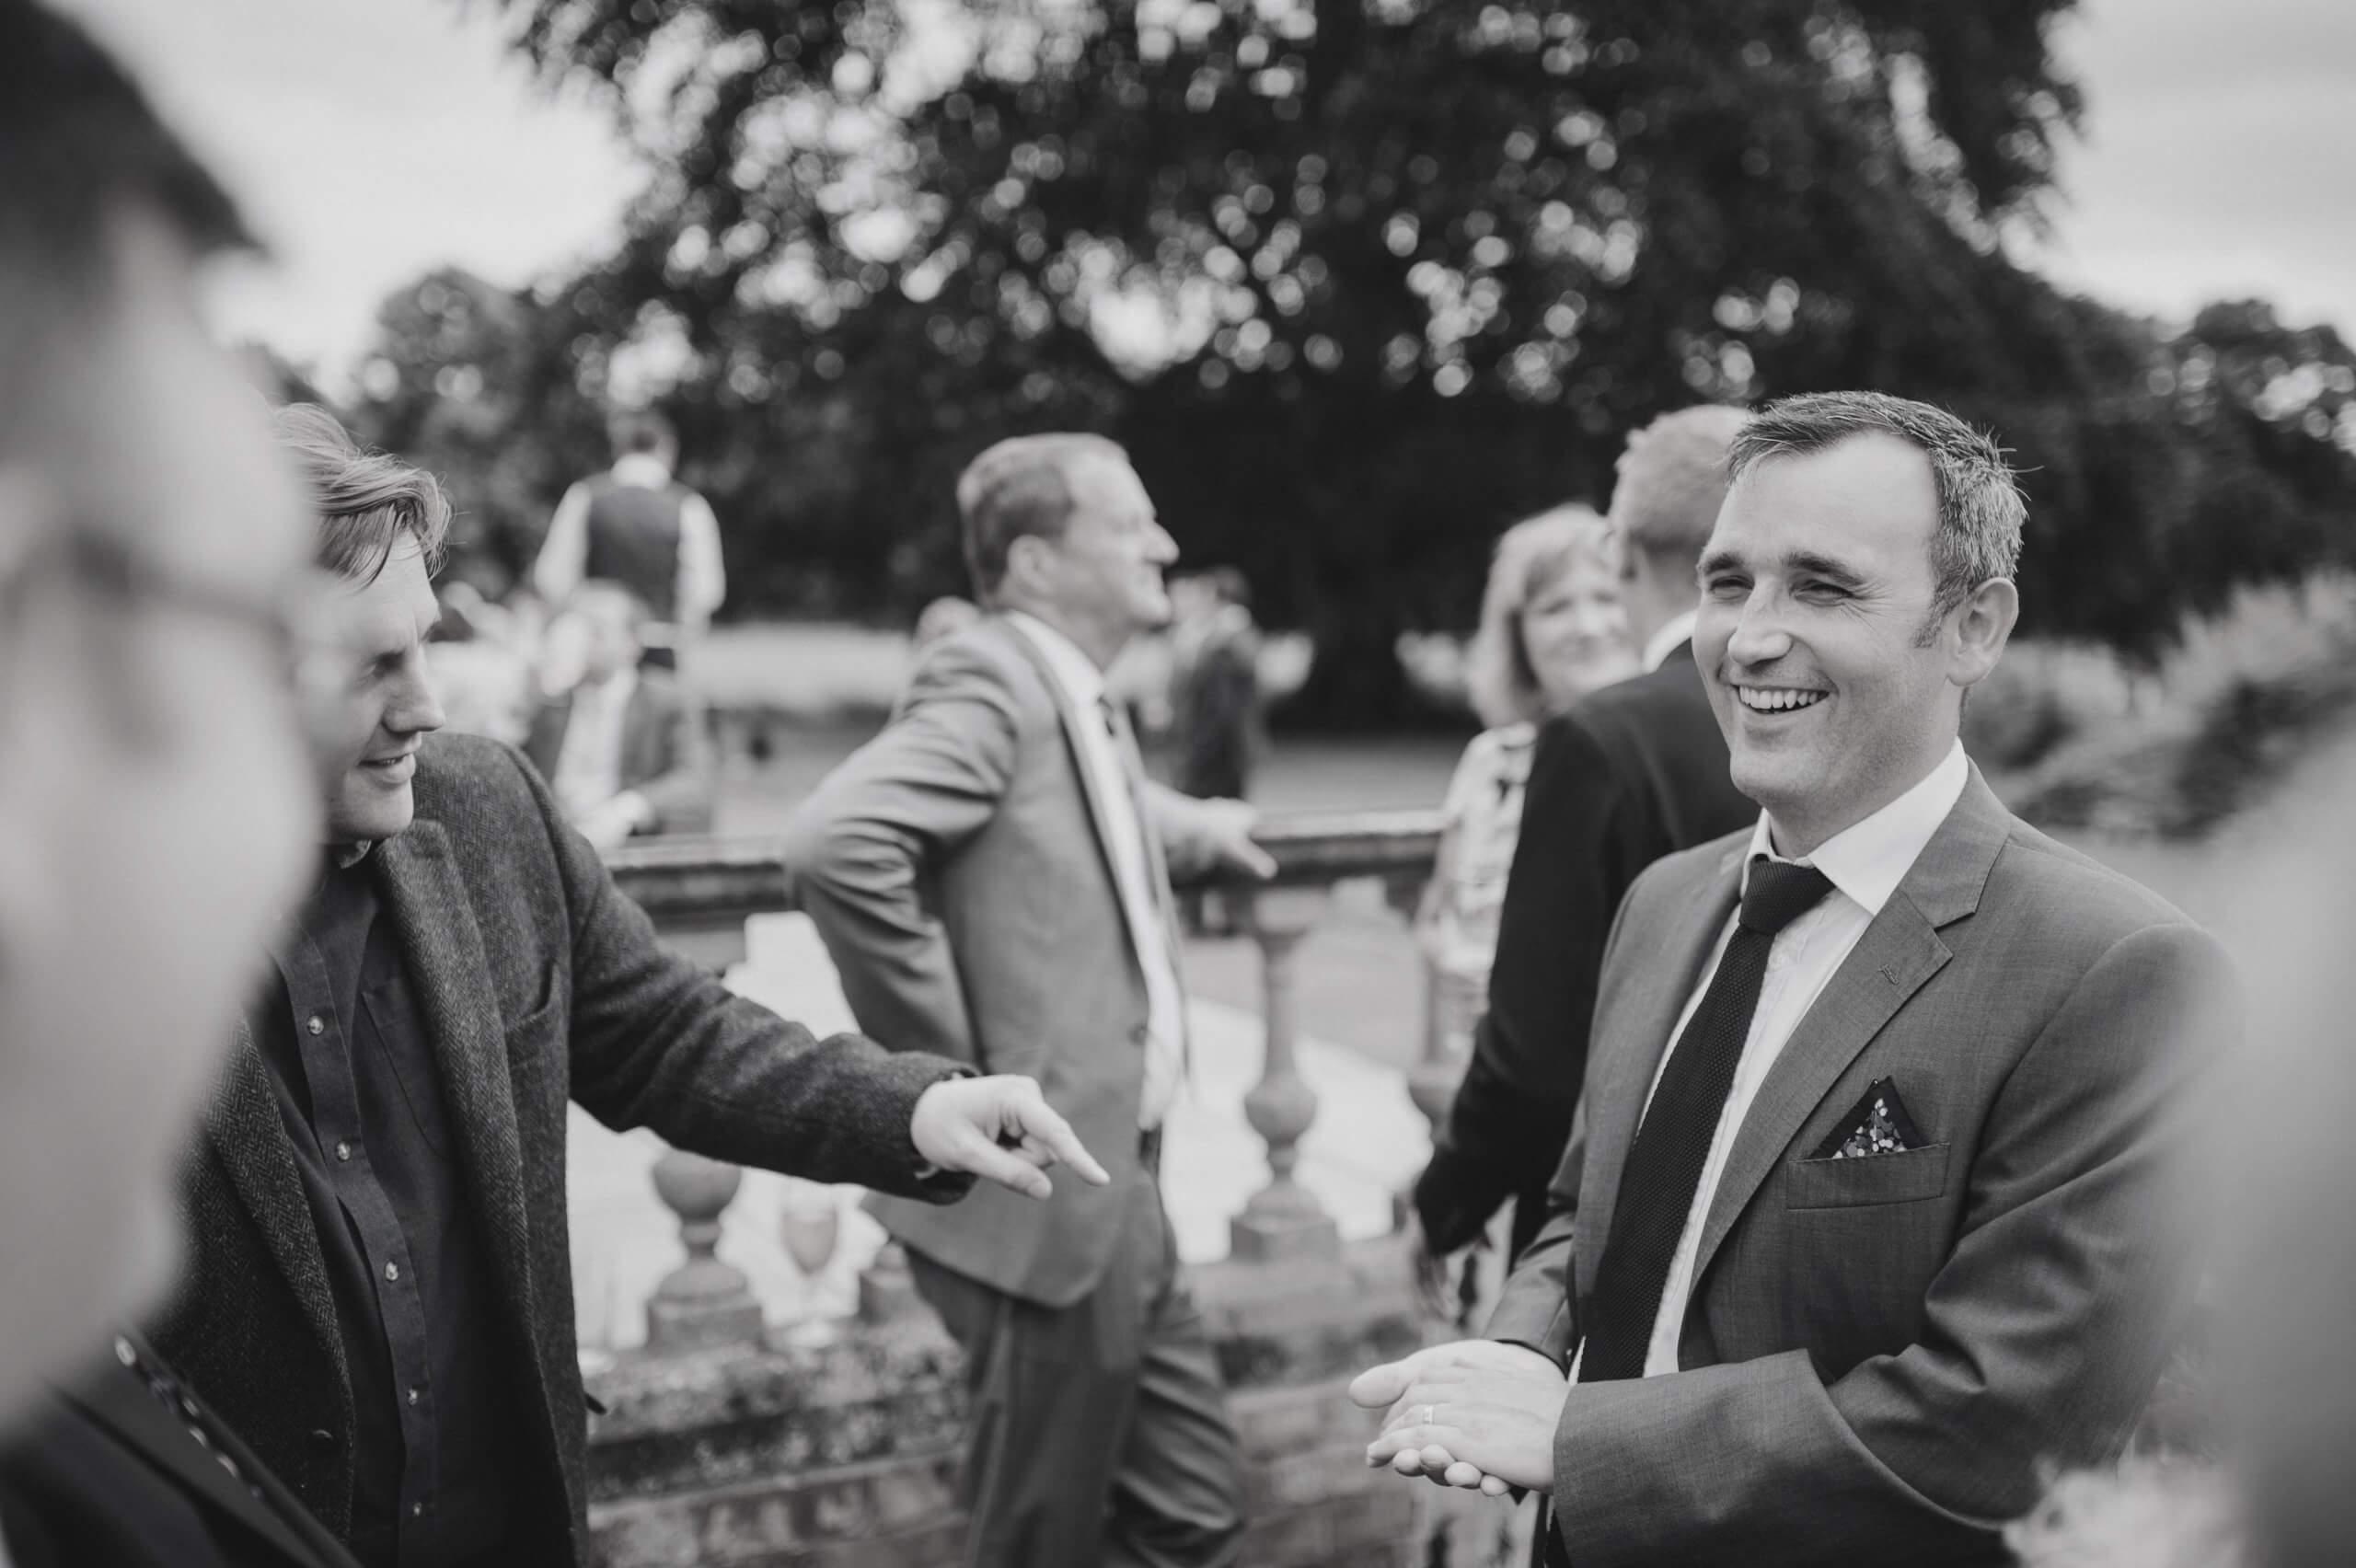 Photo showing Thoresby Weddings